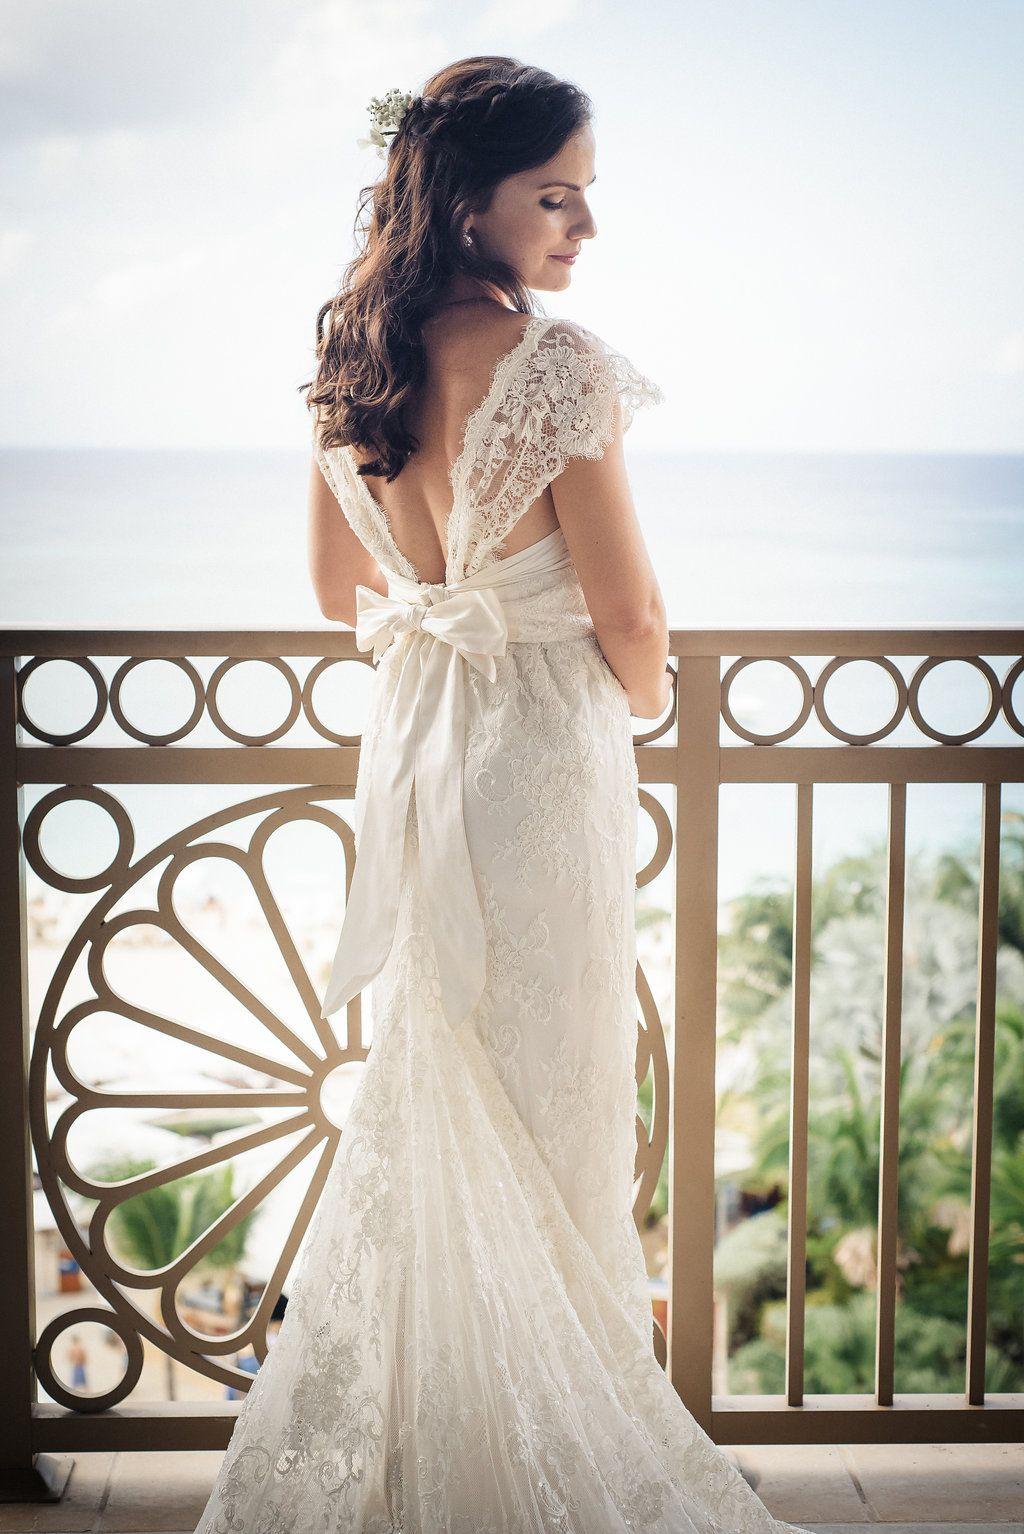 Anna Cbell Bridal Eloise Adress Handembellished Beaded Lace Wedding Dress Vintage Inspired For Old Hollywood Glamour: Anna Inspired Wedding Dress At Reisefeber.org